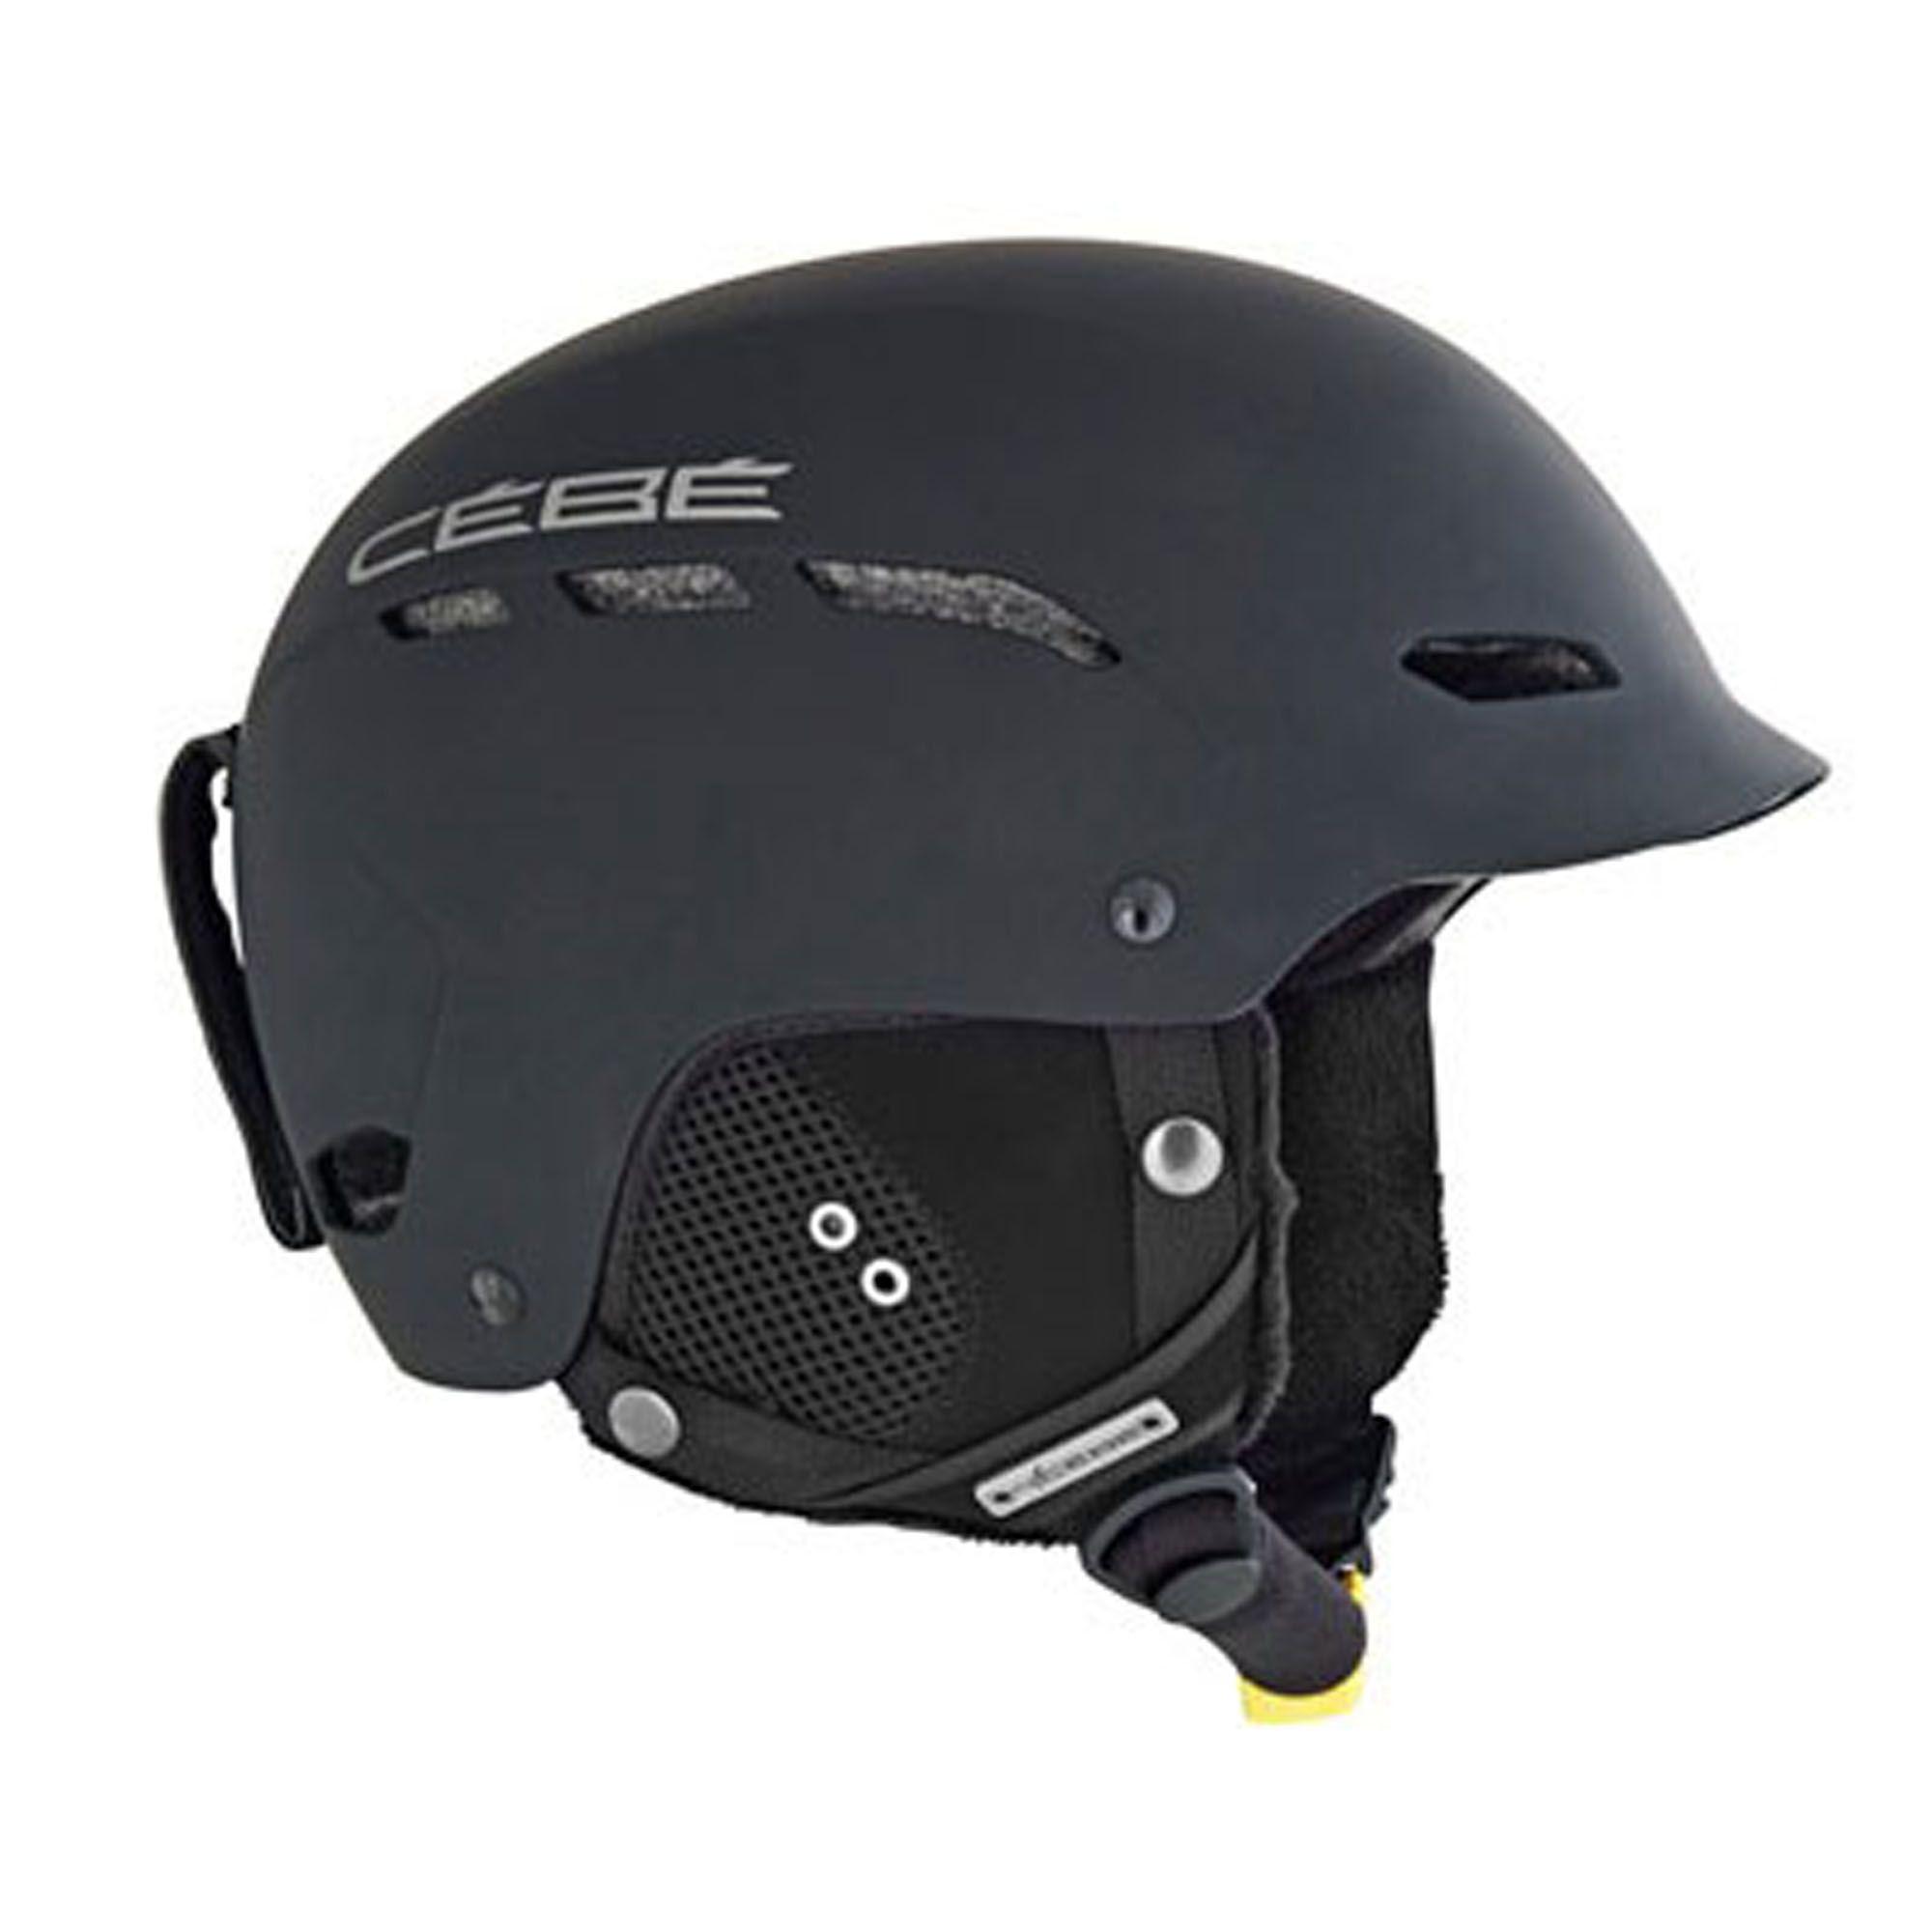 CEBE' Dusk Black 55 / 58 cm Caschi, Sci, Sport